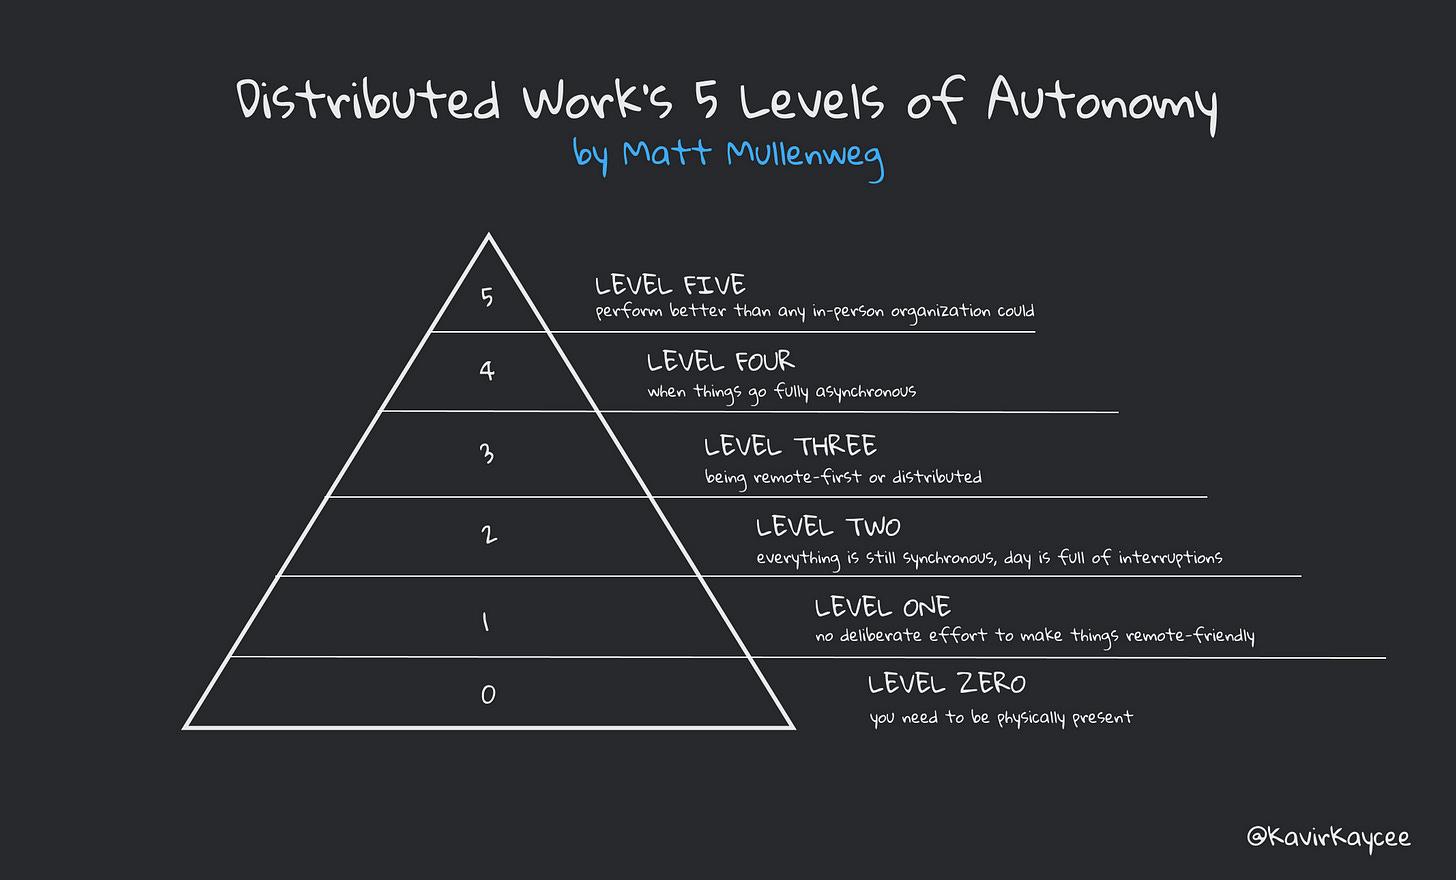 Remote Work Levels